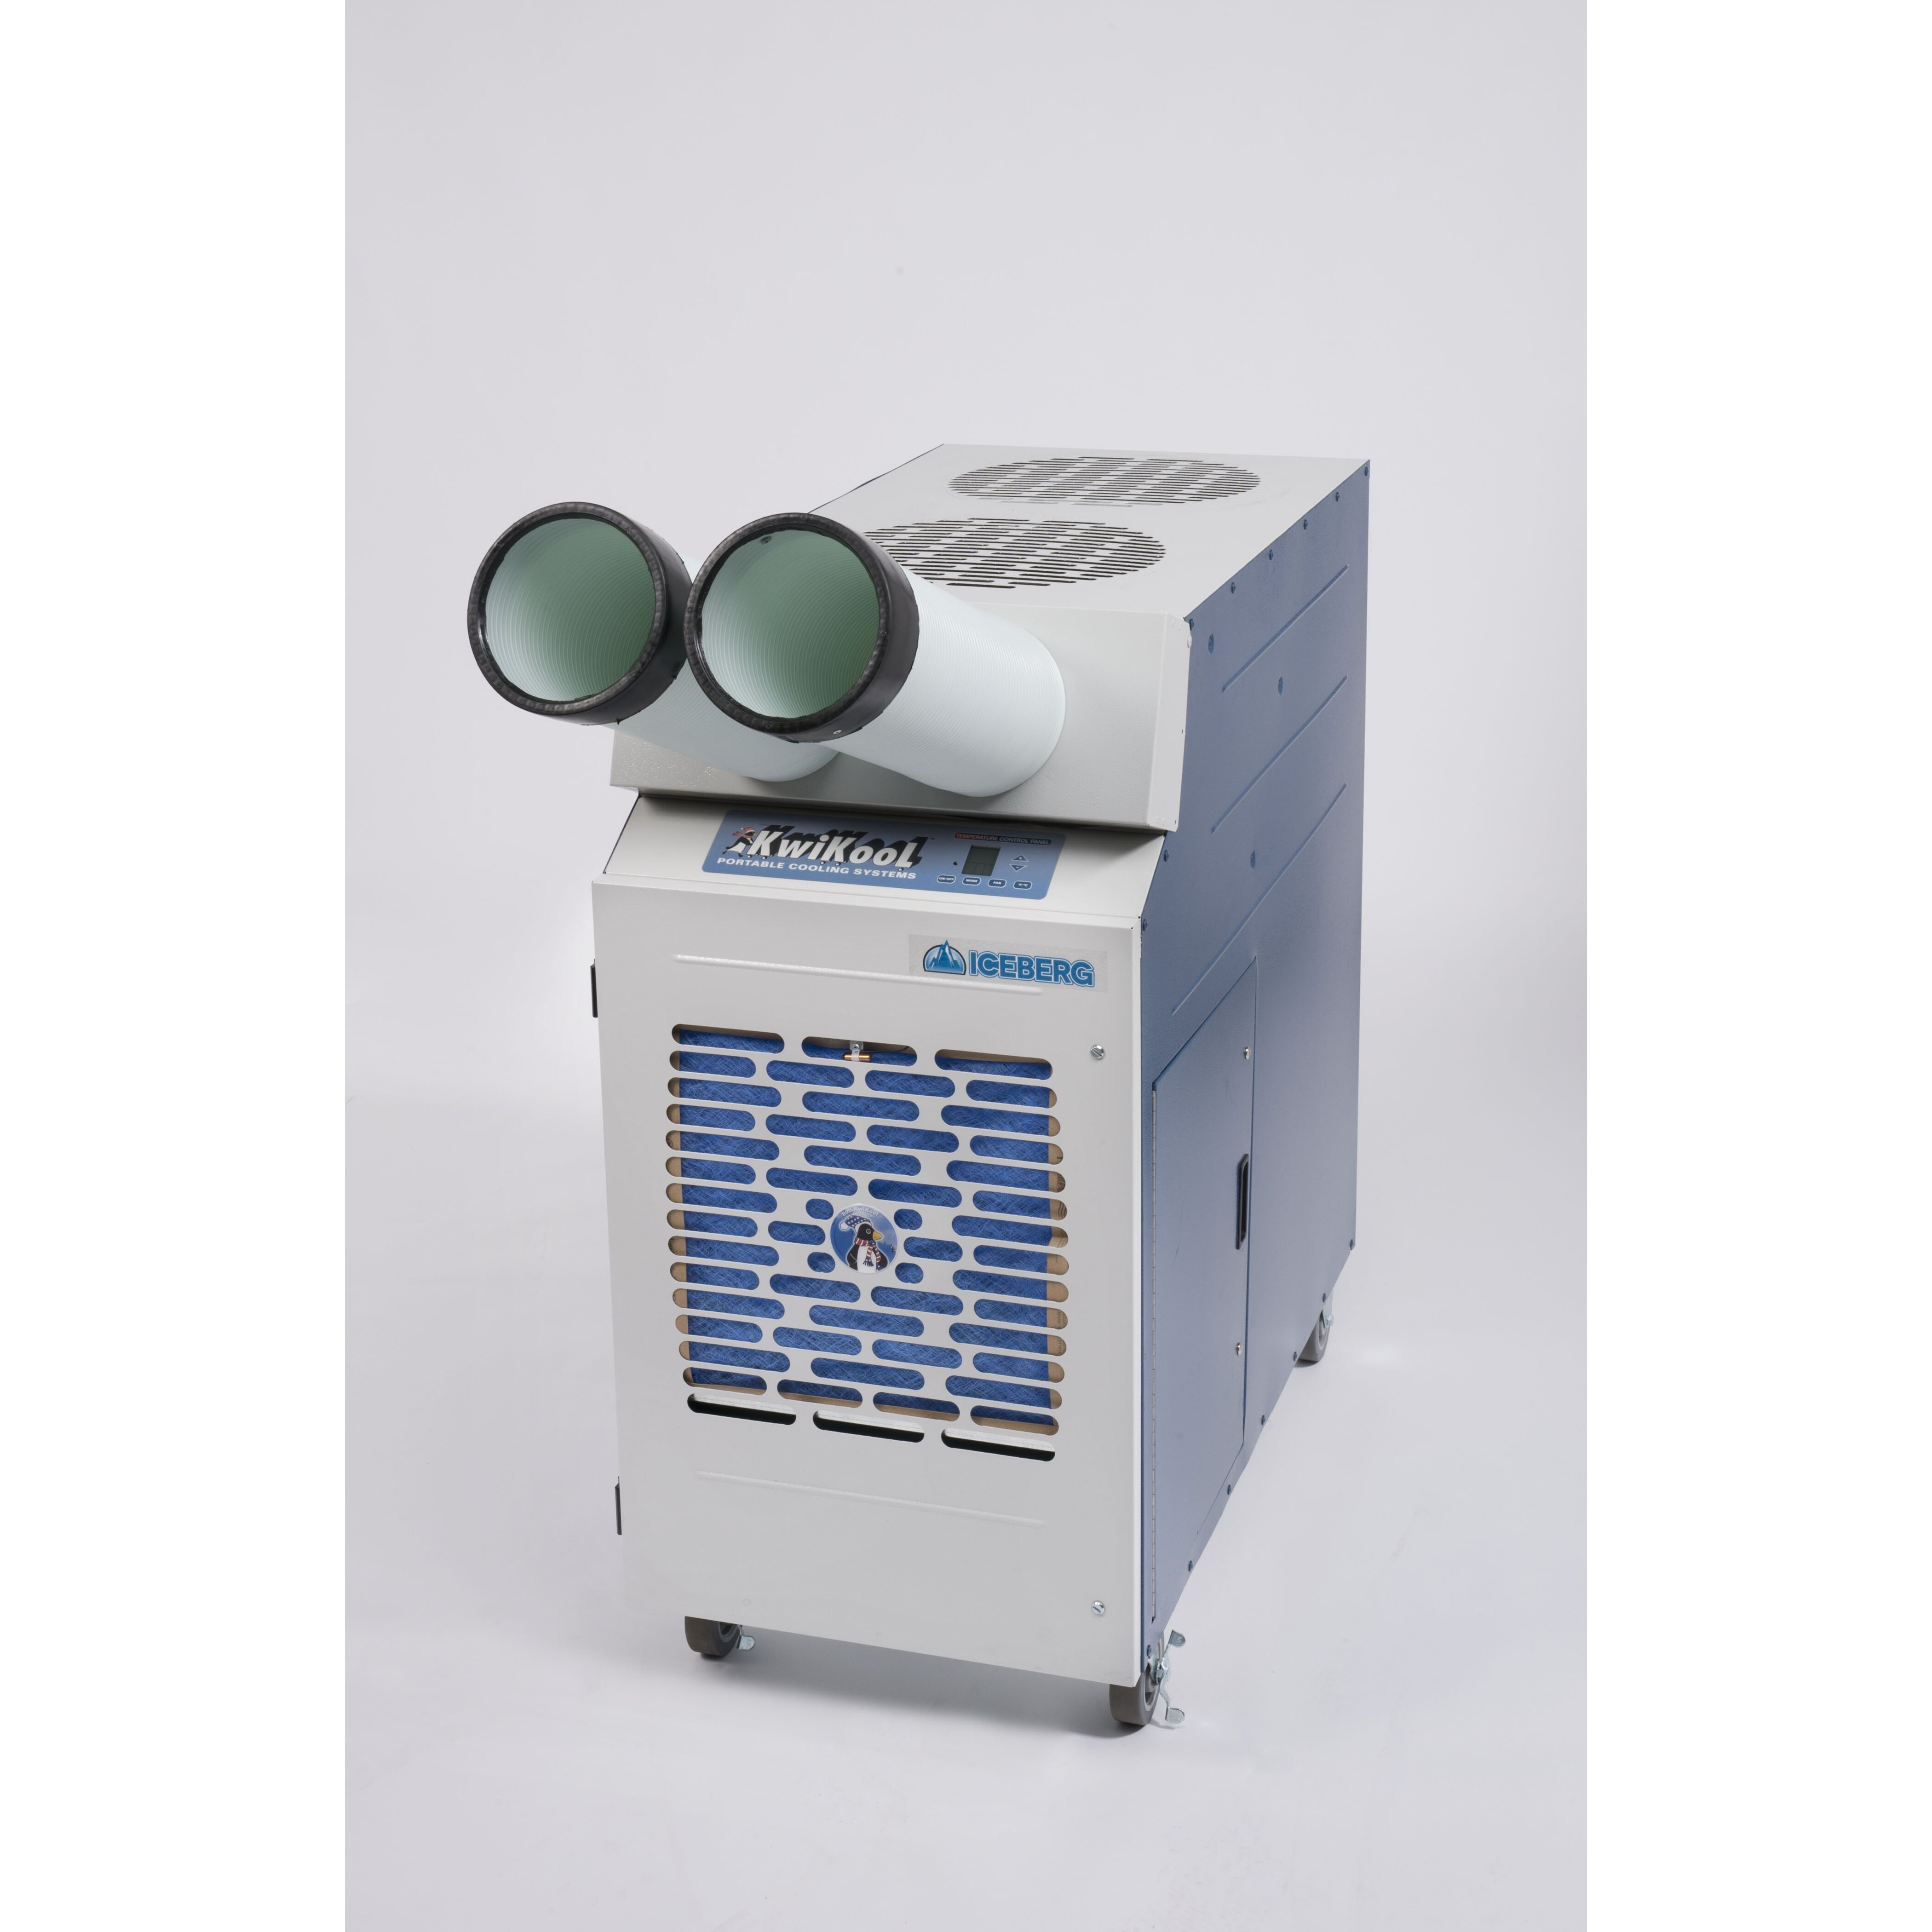 Iceberg Series 23 500 BTU Portable Air Conditioner Wayfair Supply #2E4879